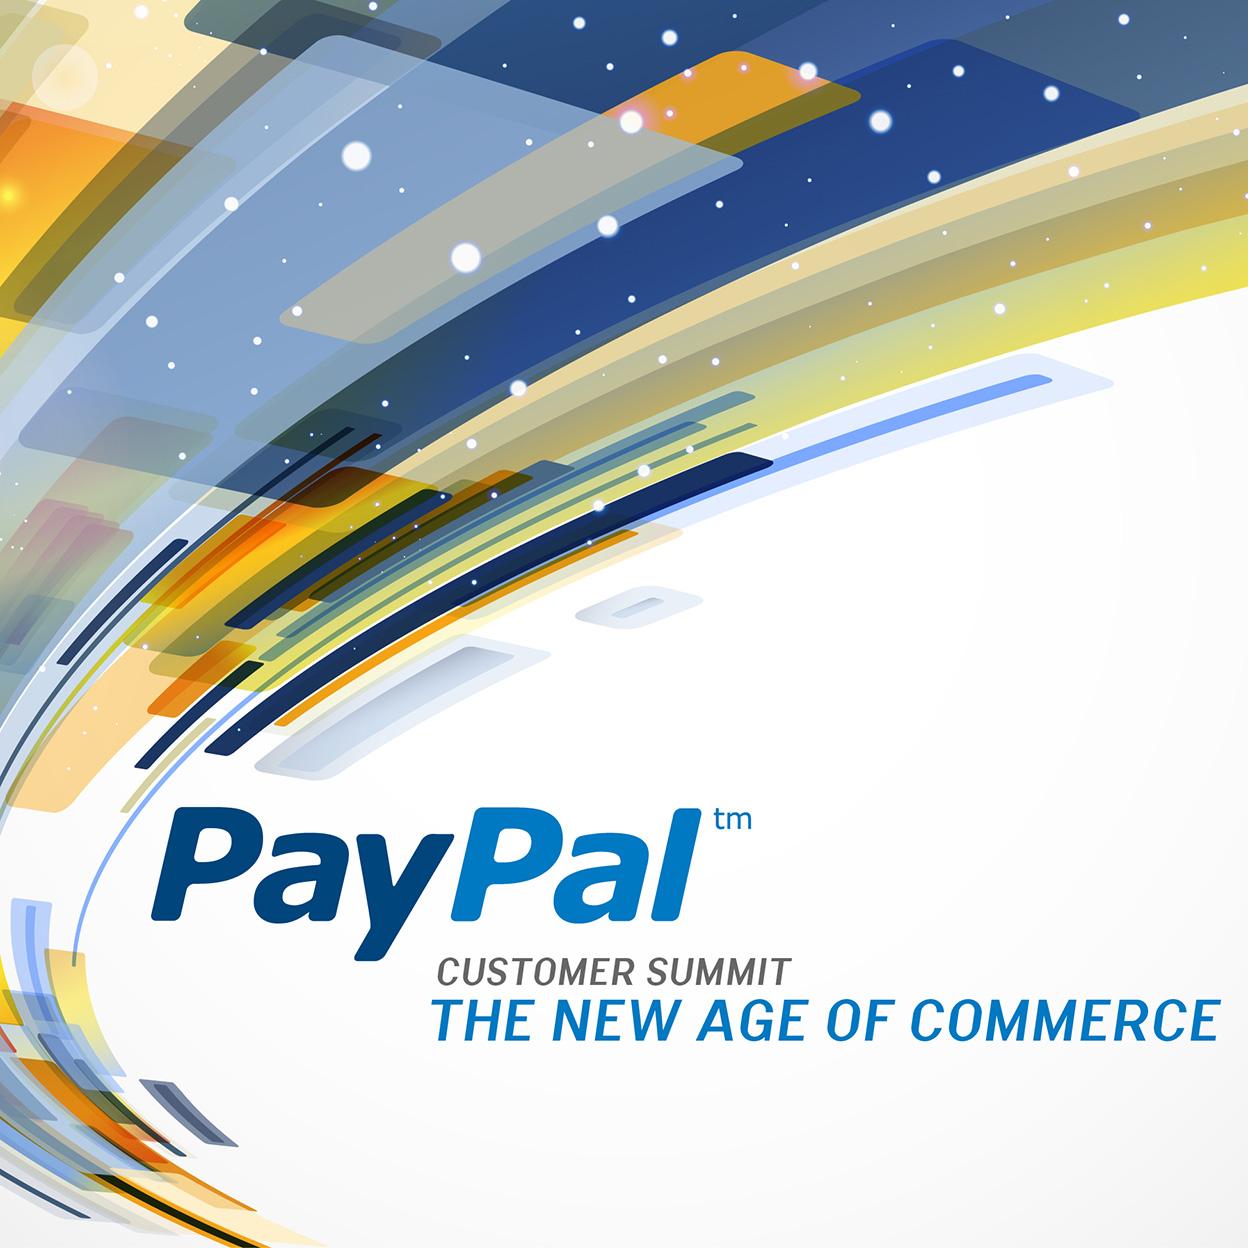 PayPal: Customer Summit